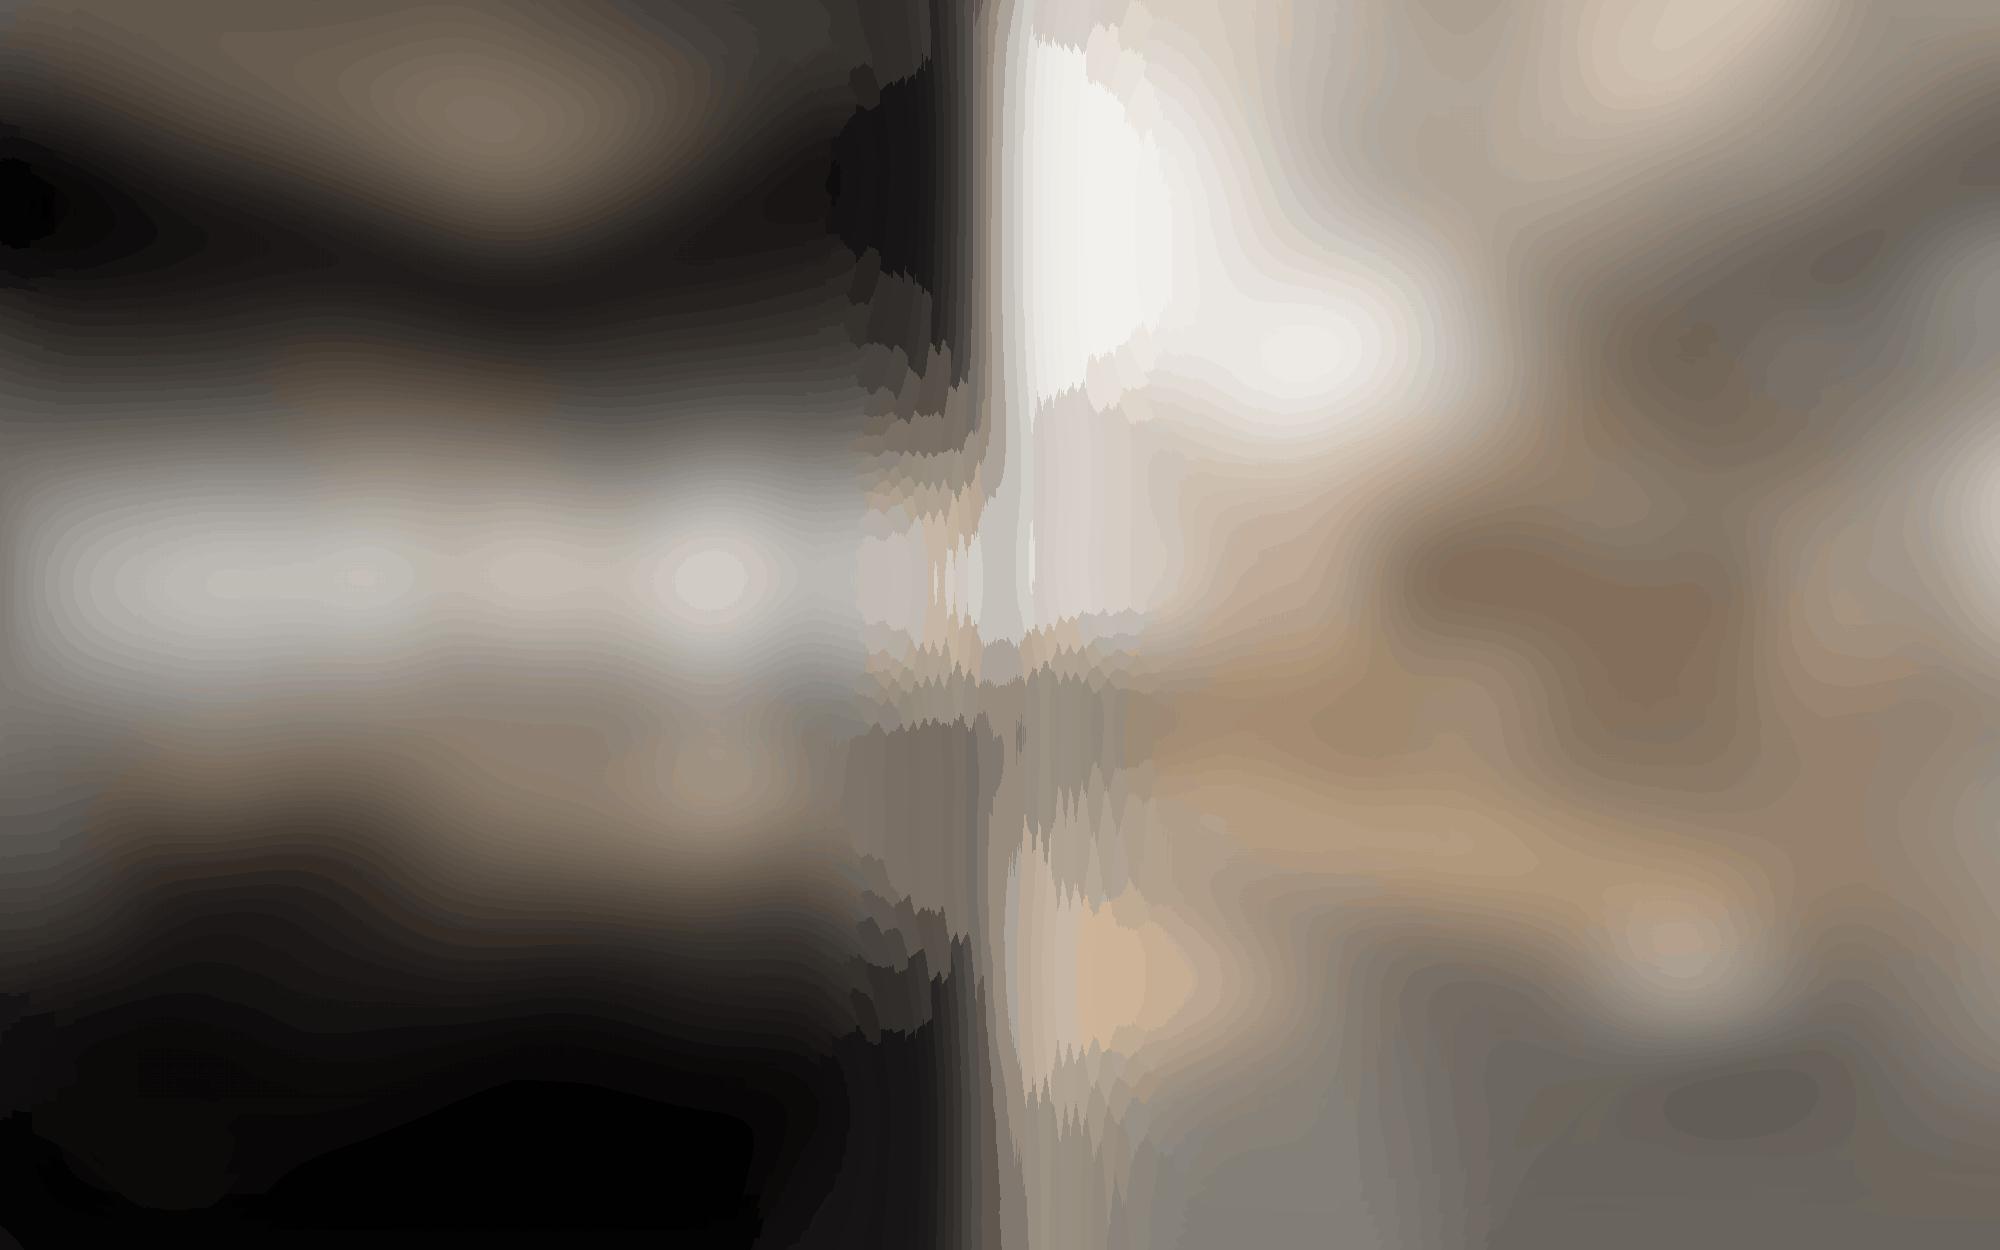 Keith haring joana filipe james mason tateliverpool lectureinprogress process 12 autocompressfitresizeixlibphp 1 1 0max h2000max w3 D2000q80s3332b708df5f8e4c5ef7f40c7990a214